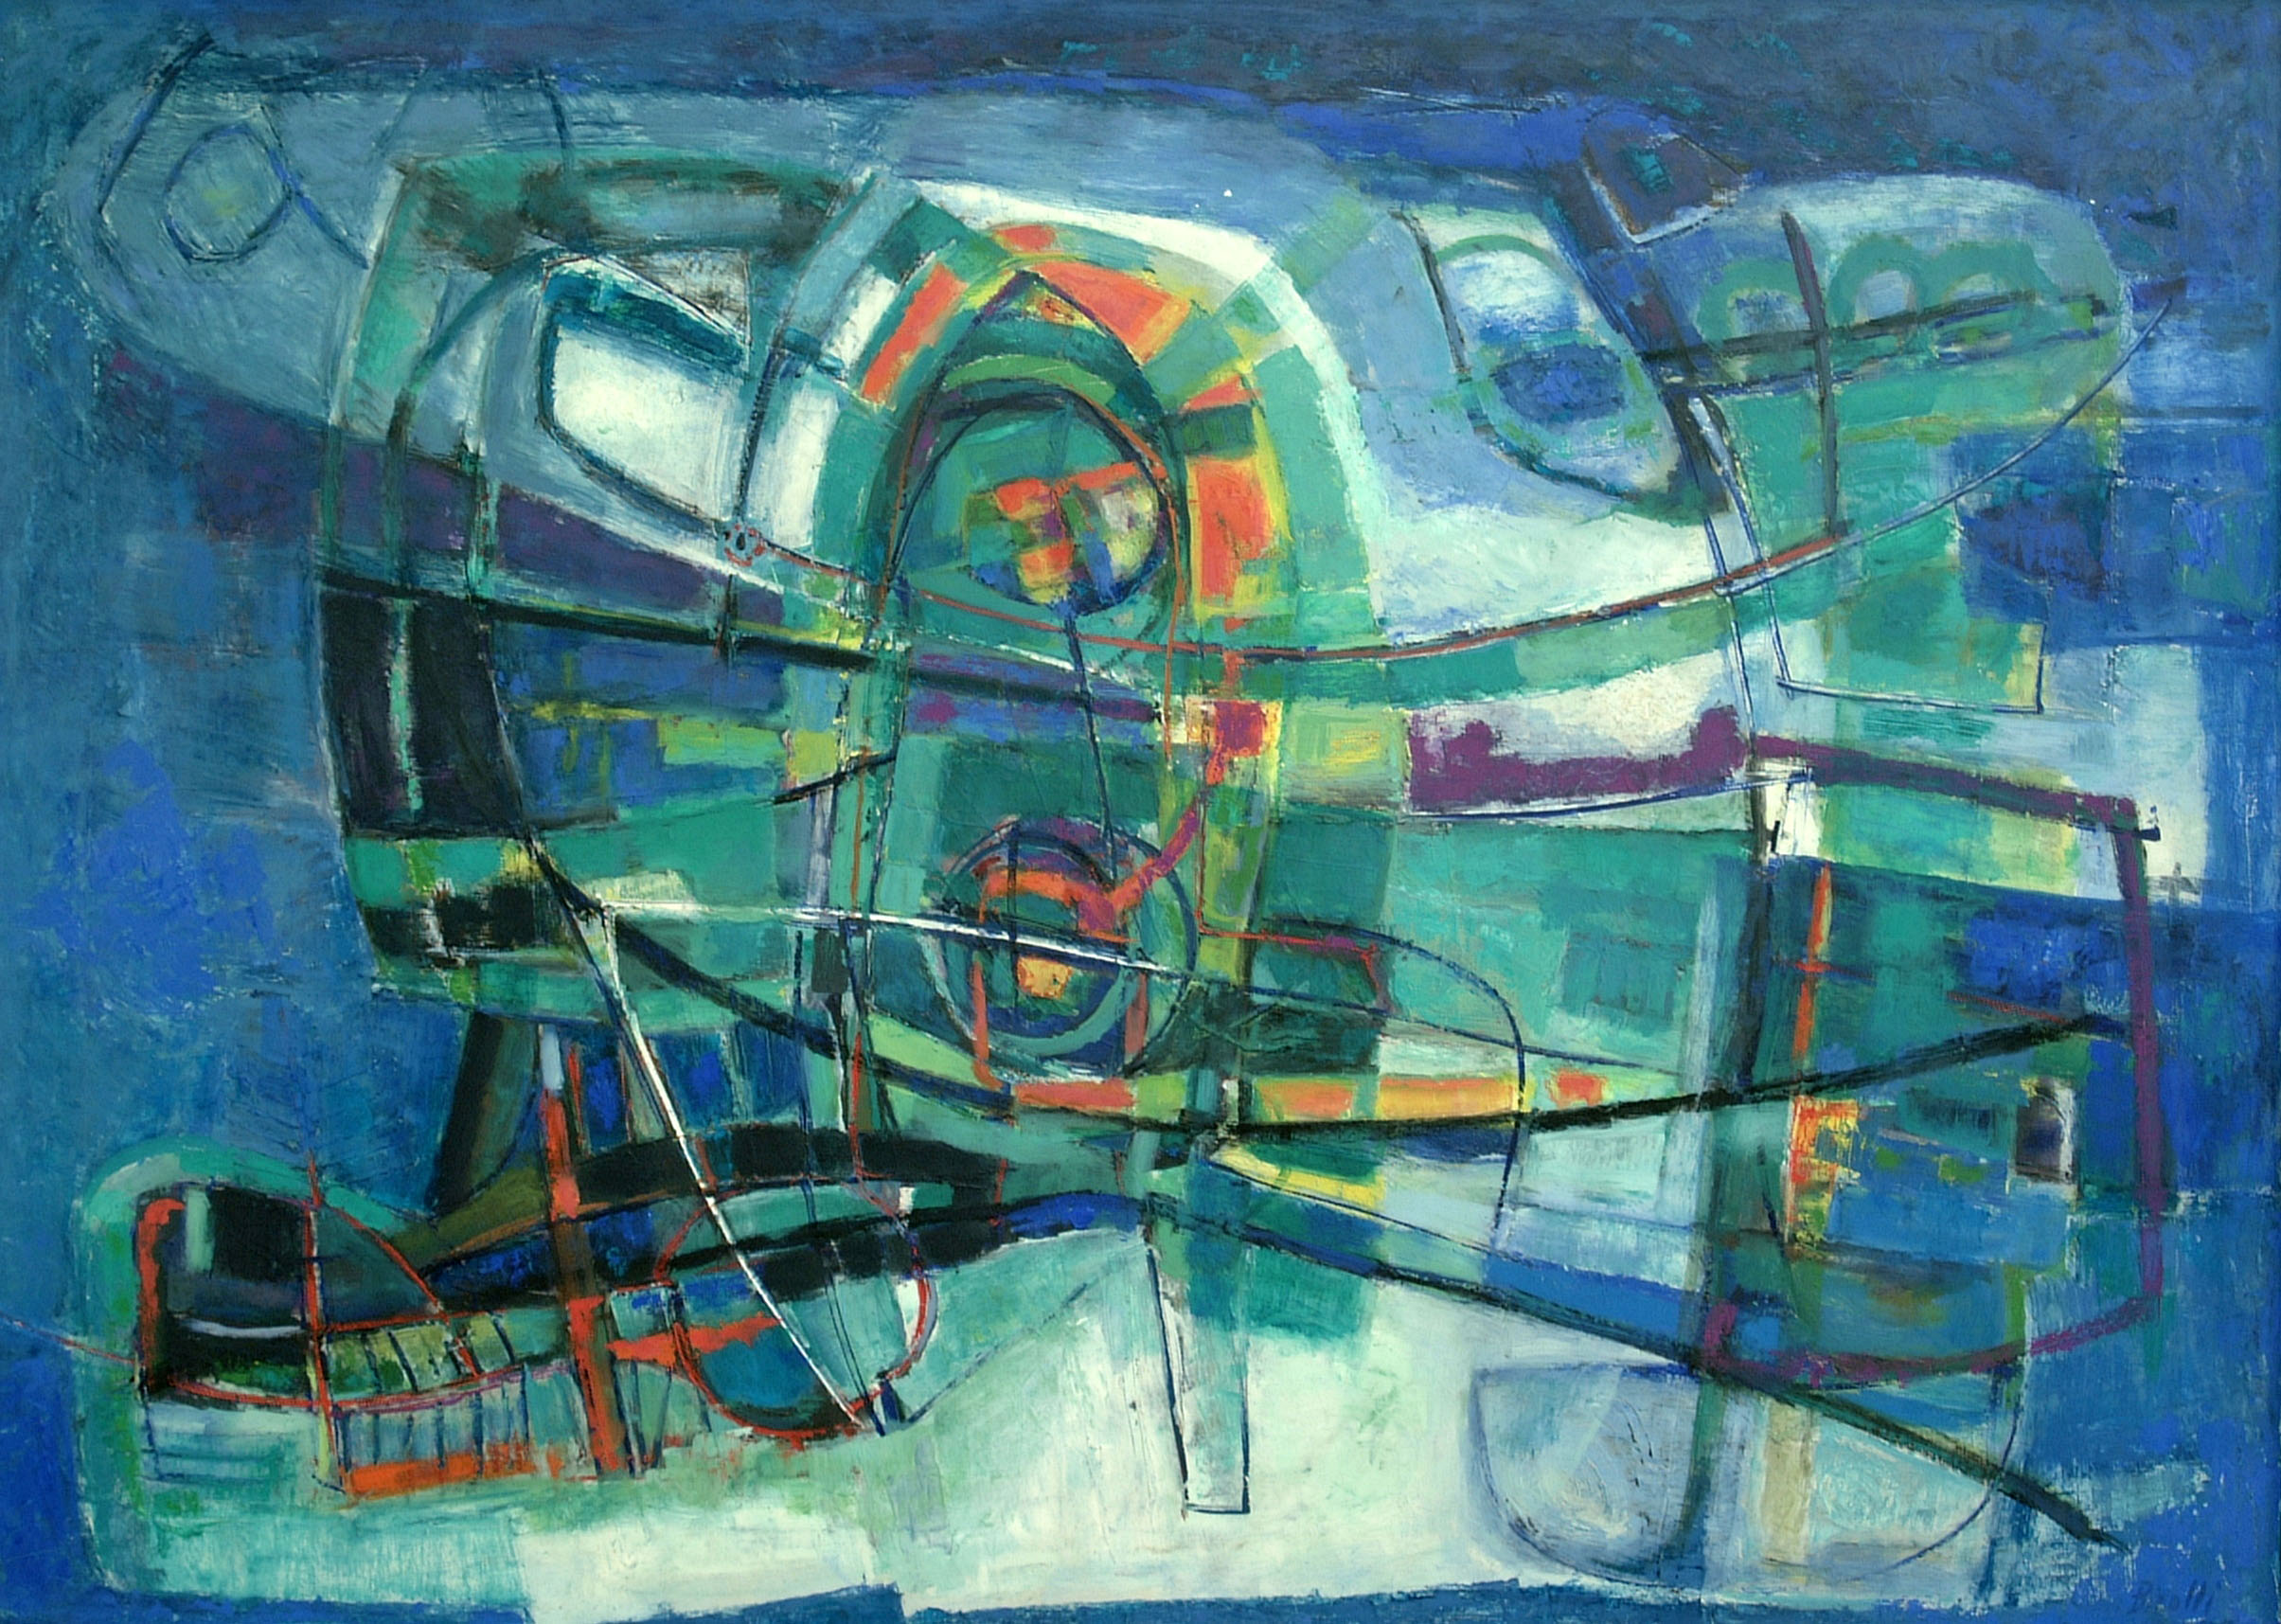 Renato Birolli, Ondulazione Marina, 1955  via